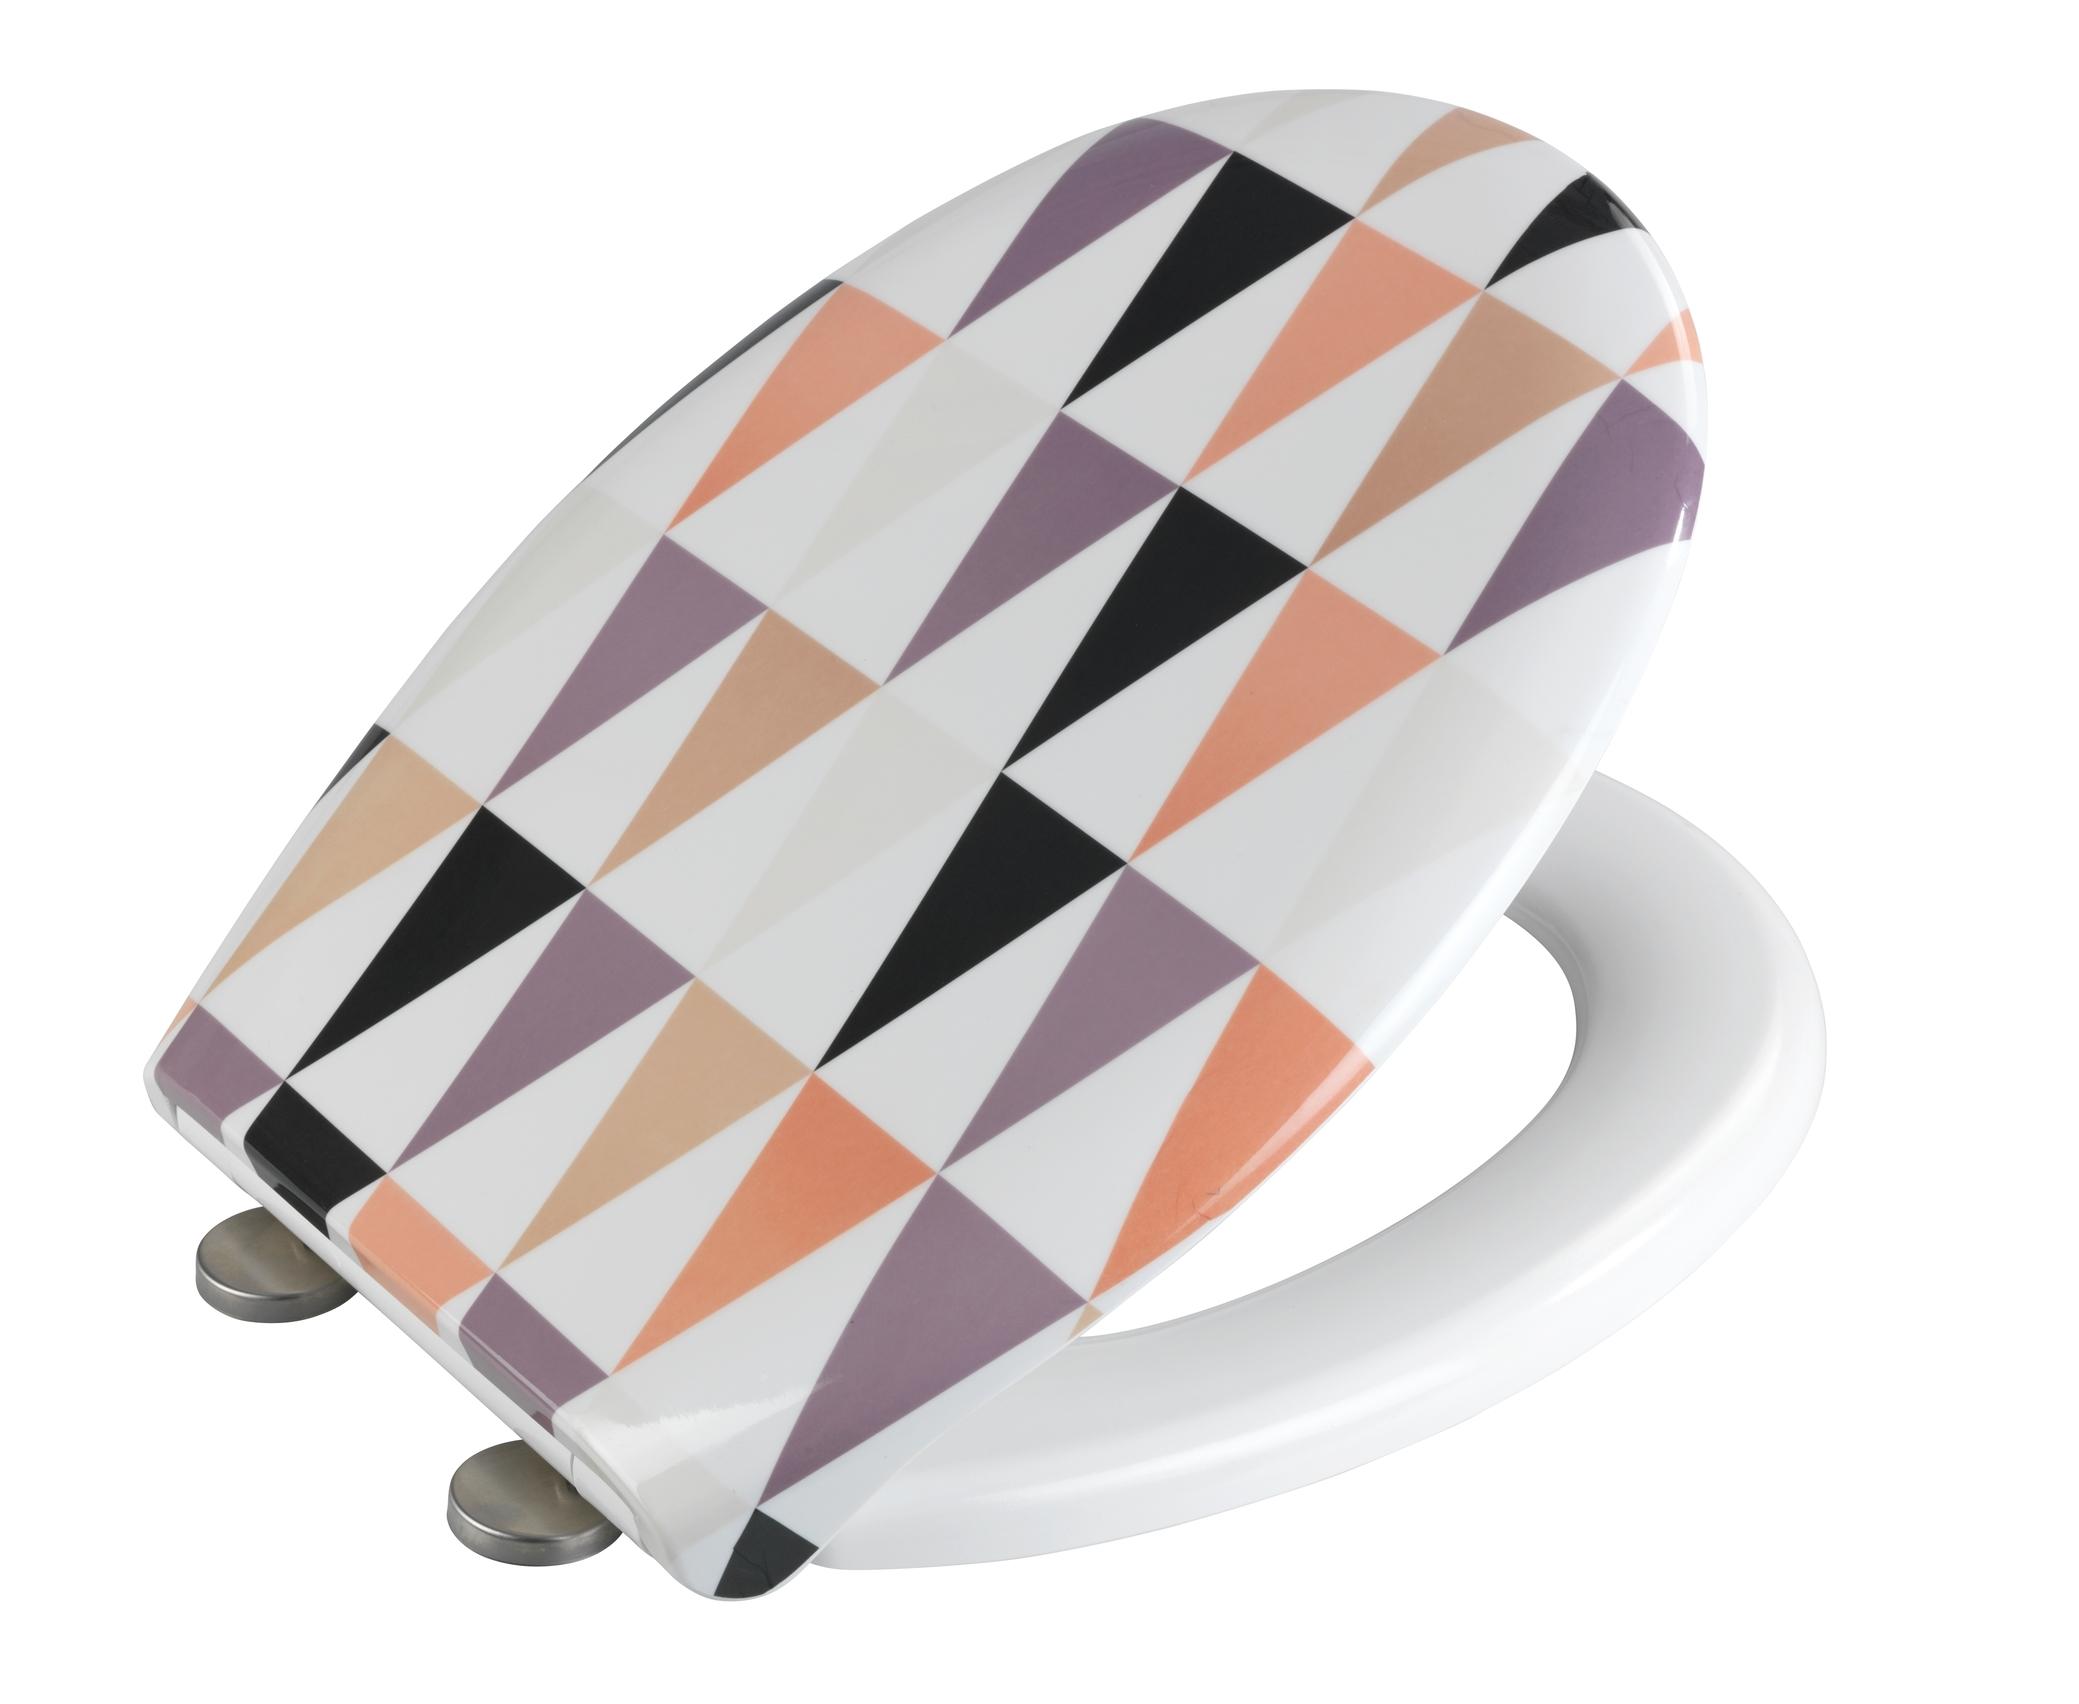 Capac toaleta din duroplast, Pyramide Multicolor, l37xA44,5 cm imagine